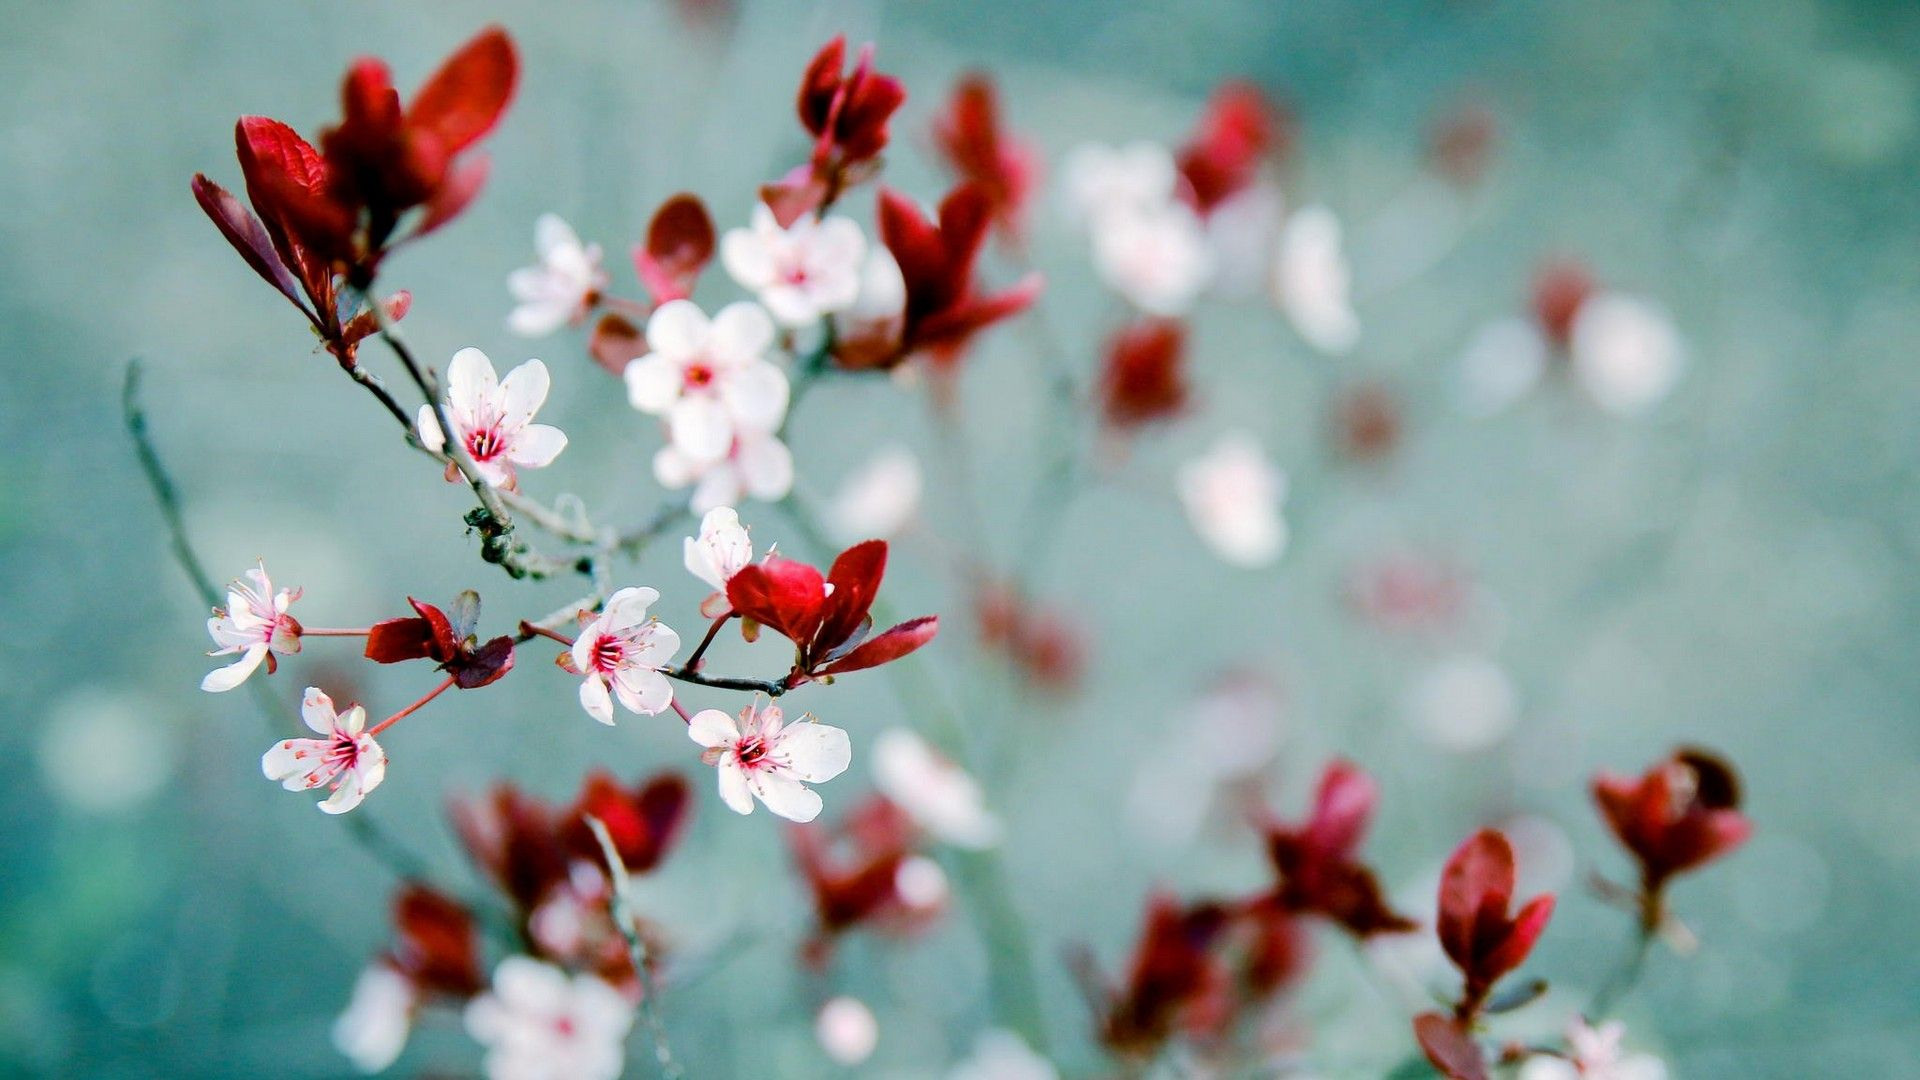 Hd Wallpaper Spring Flowers 2021 Live Wallpaper Hd Spring Wallpaper Spring Pictures Hello Spring Wallpaper